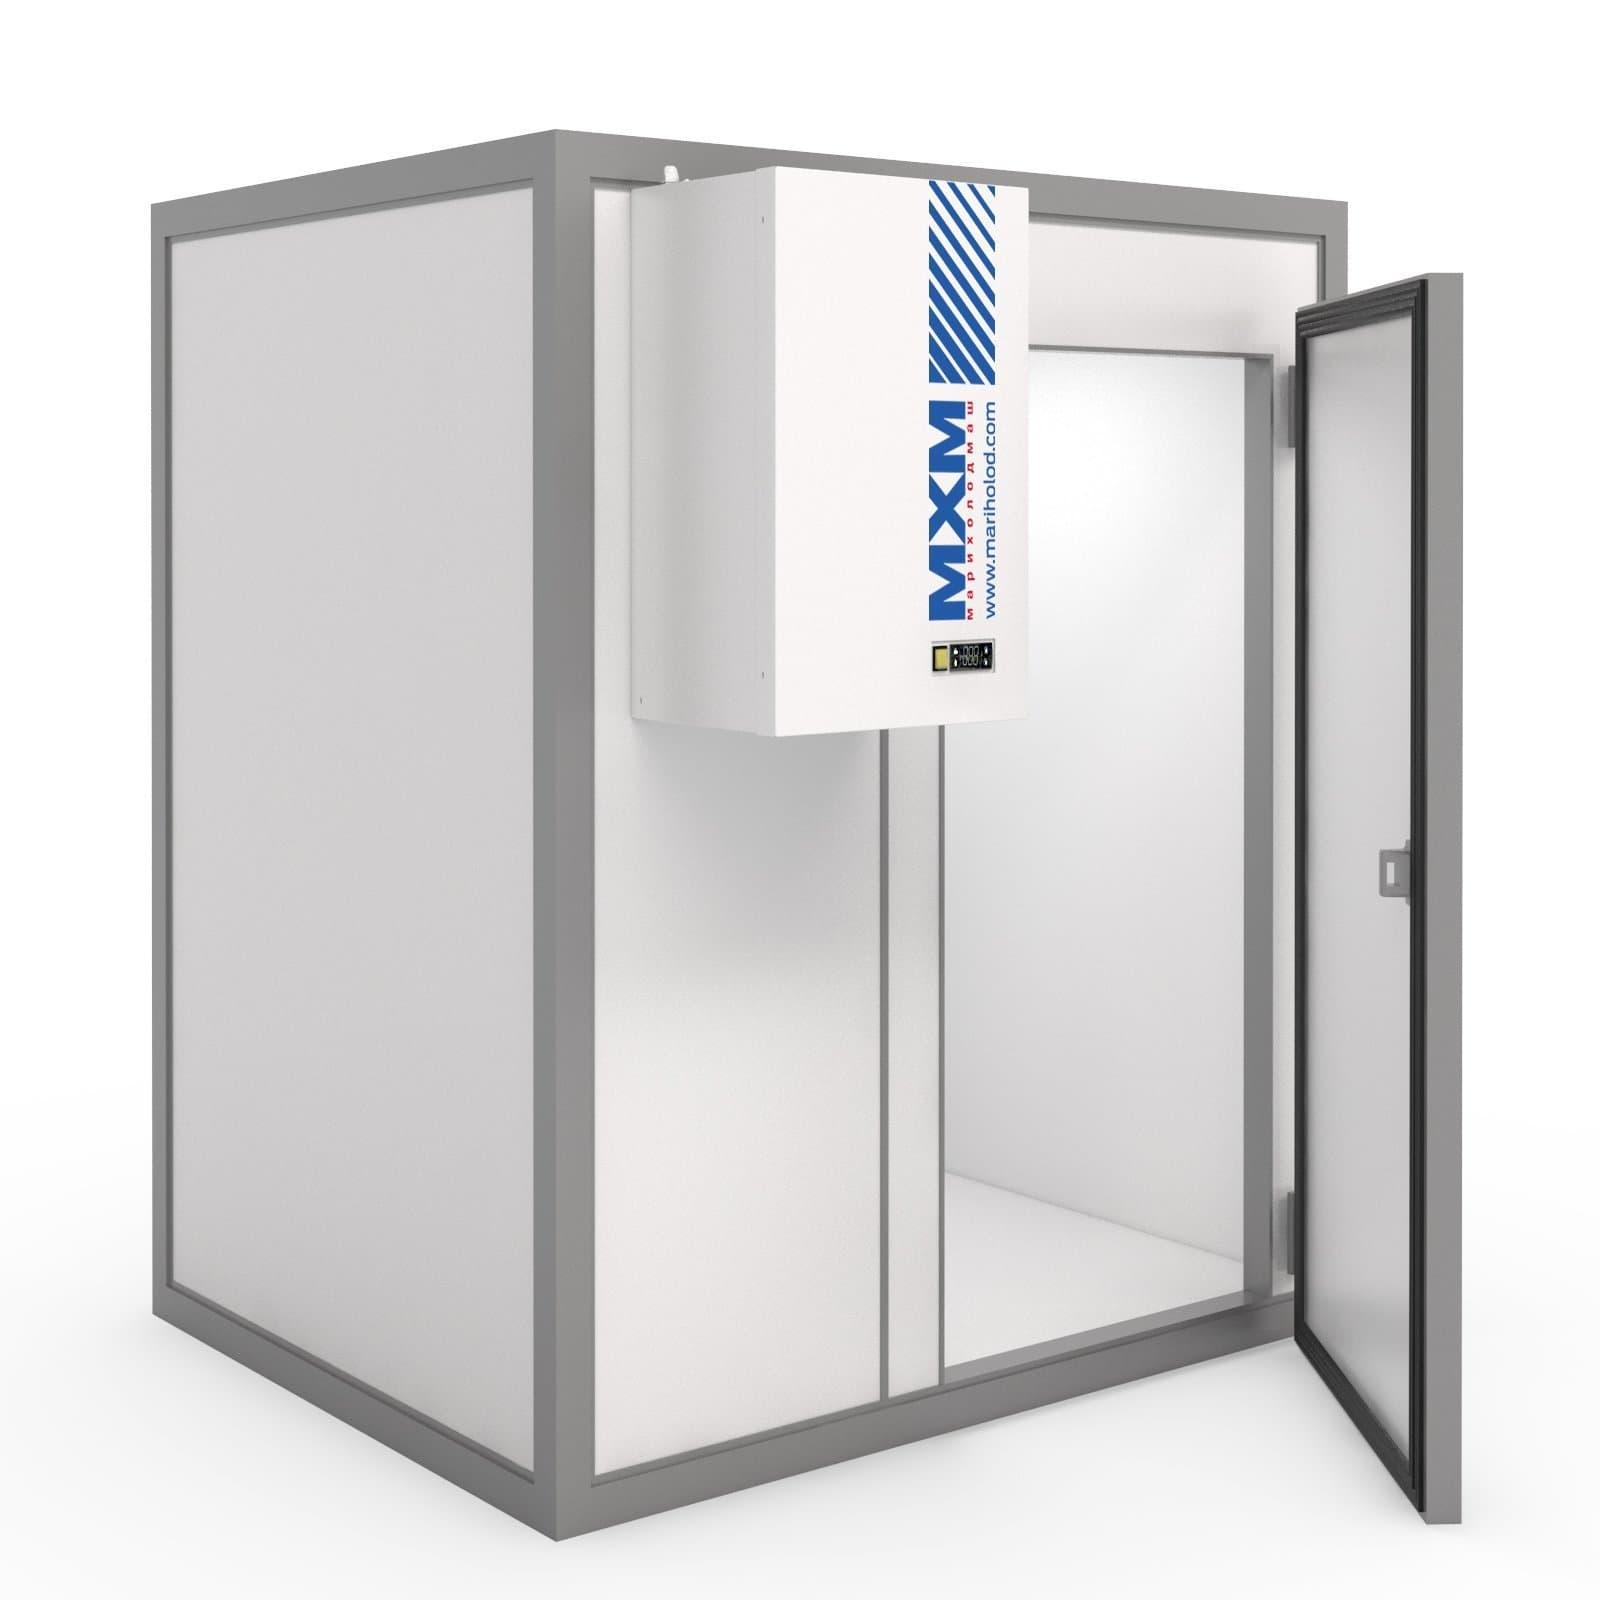 Камера холодильная КХН-105,98 (2560×19360×2460 мм)